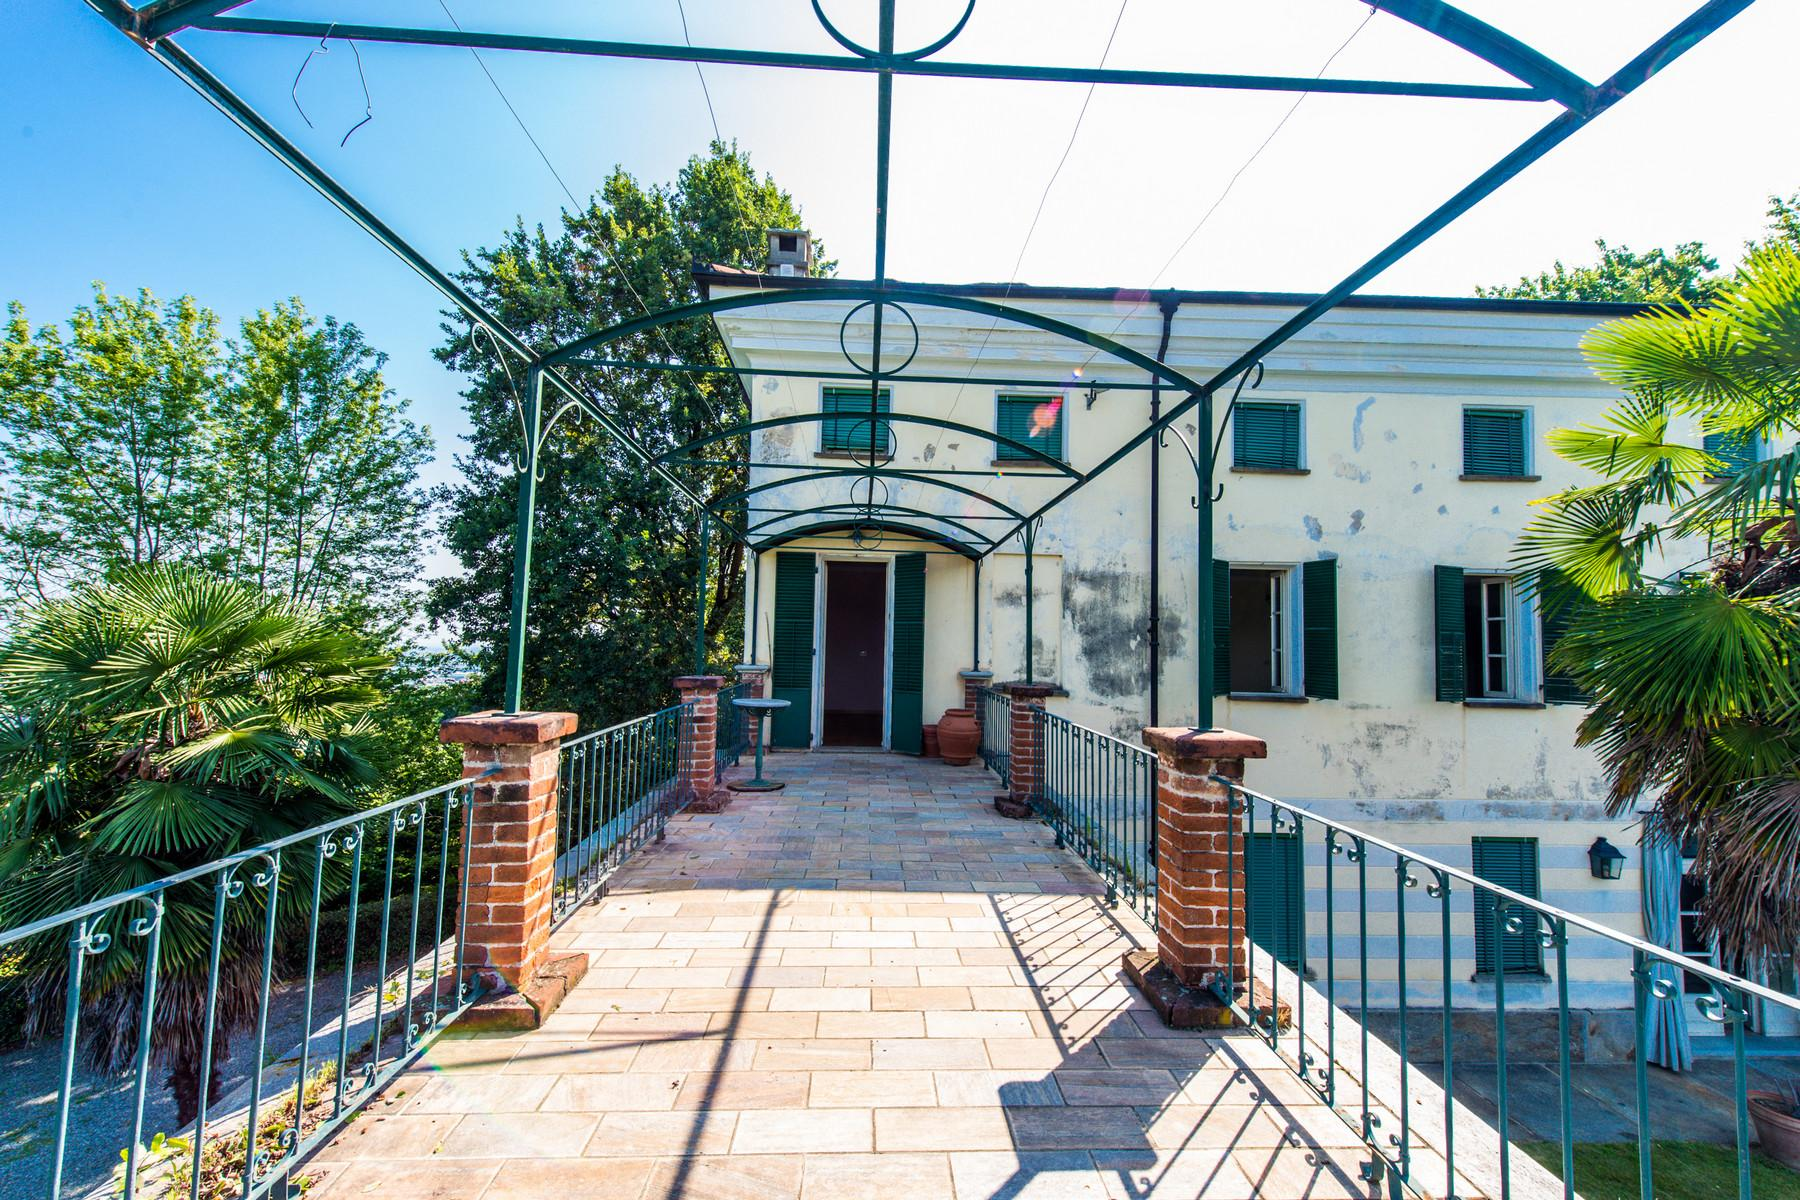 Splendid villa with winery in Piedmont - 23